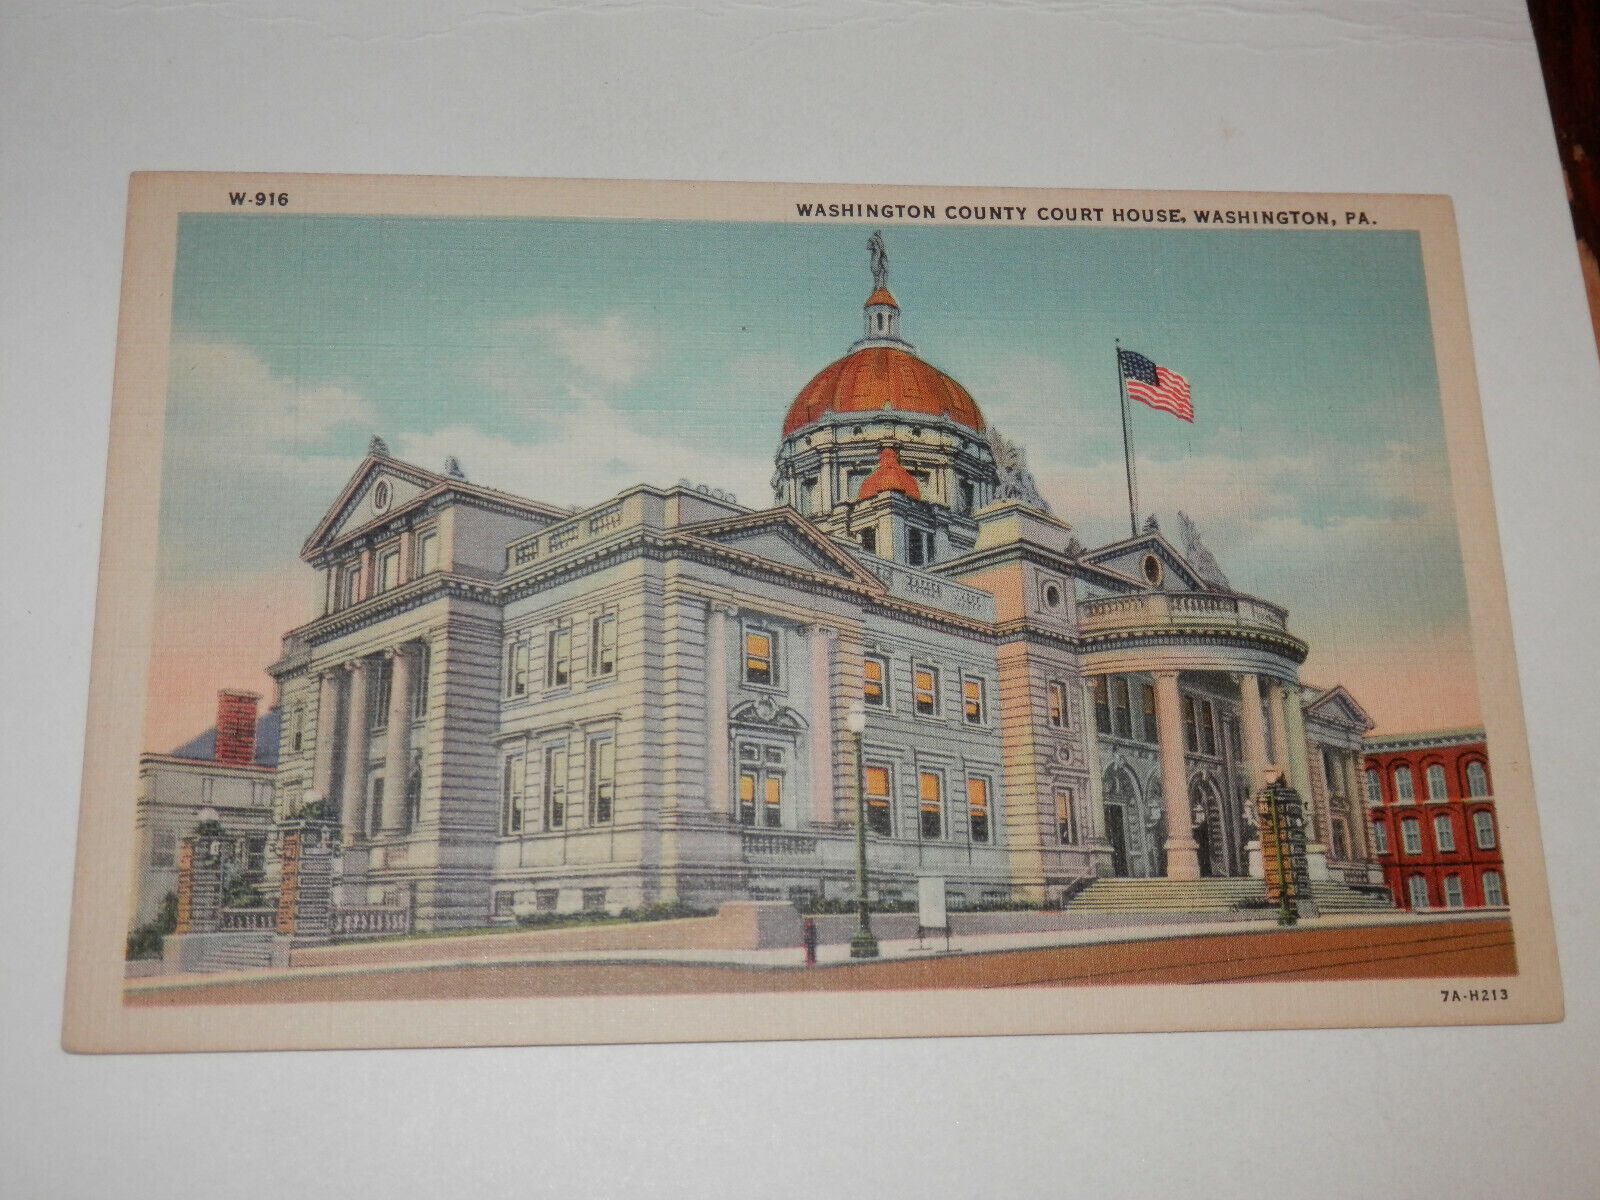 WASHINGTON PA - 1930-1950 ERA POSTCARD - COURT HOUSE